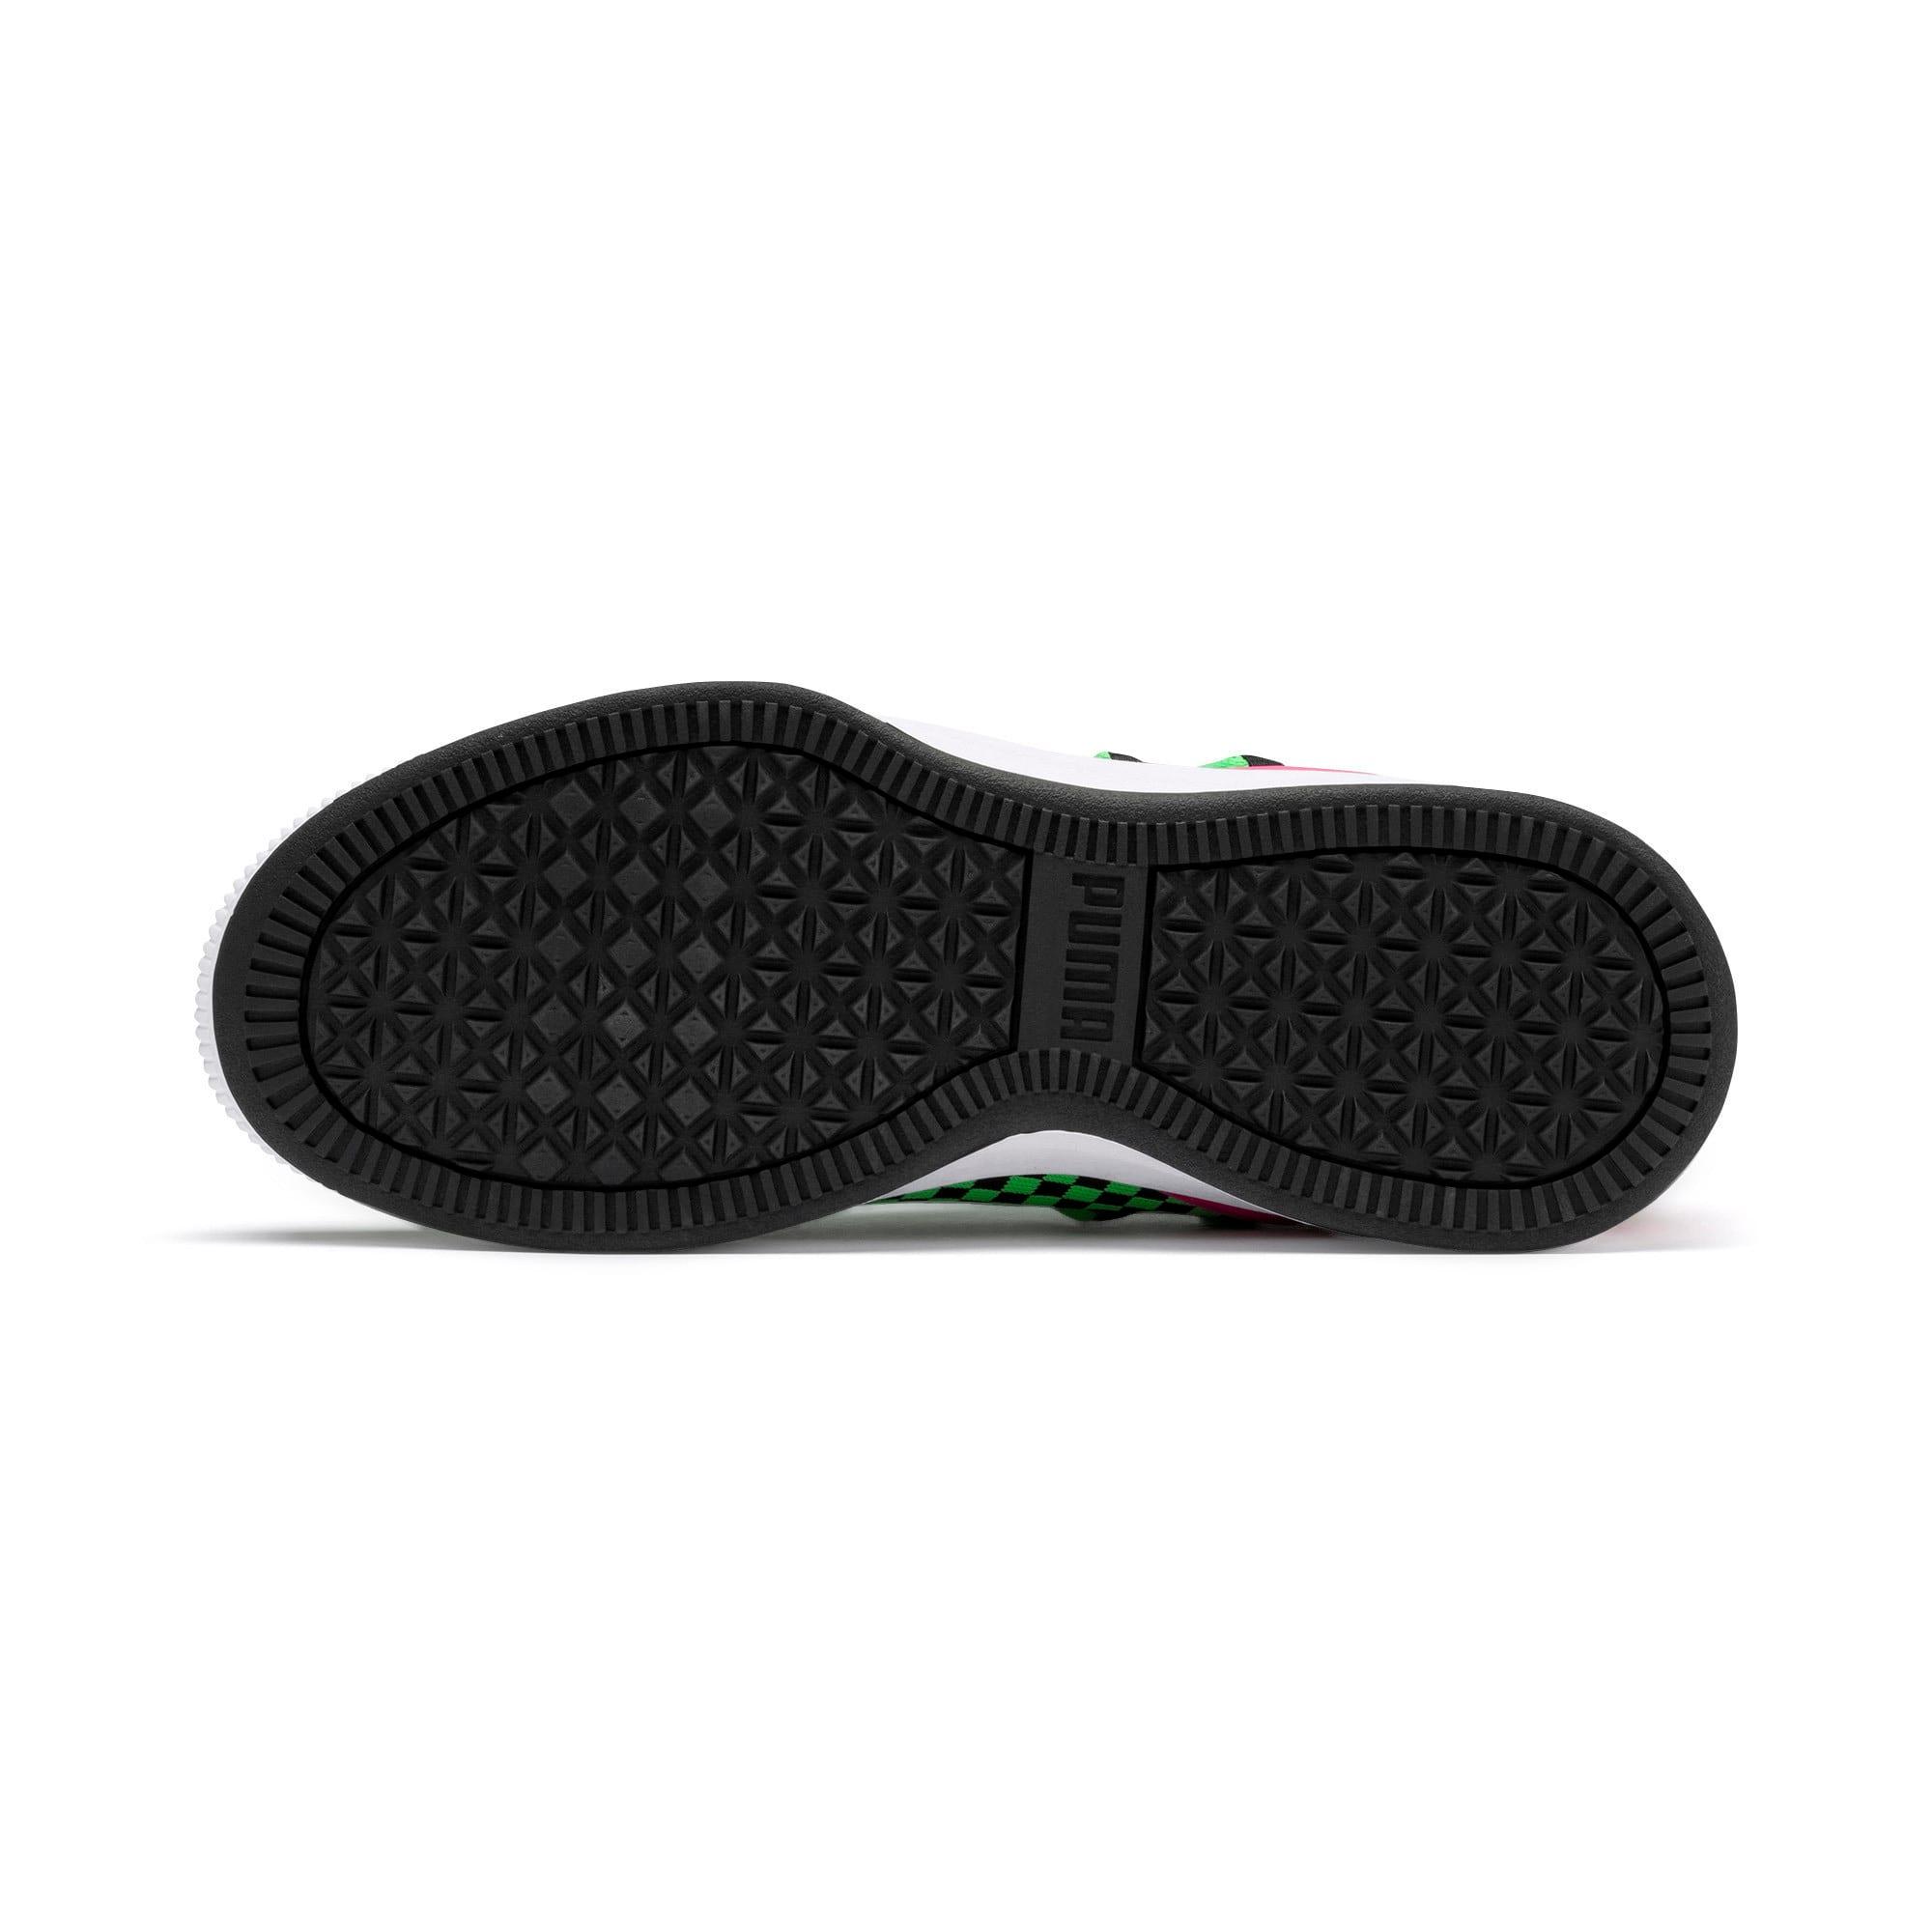 Thumbnail 4 of Clyde Court Summertime Basketball Shoes, 802 C Fluro Green PES, medium